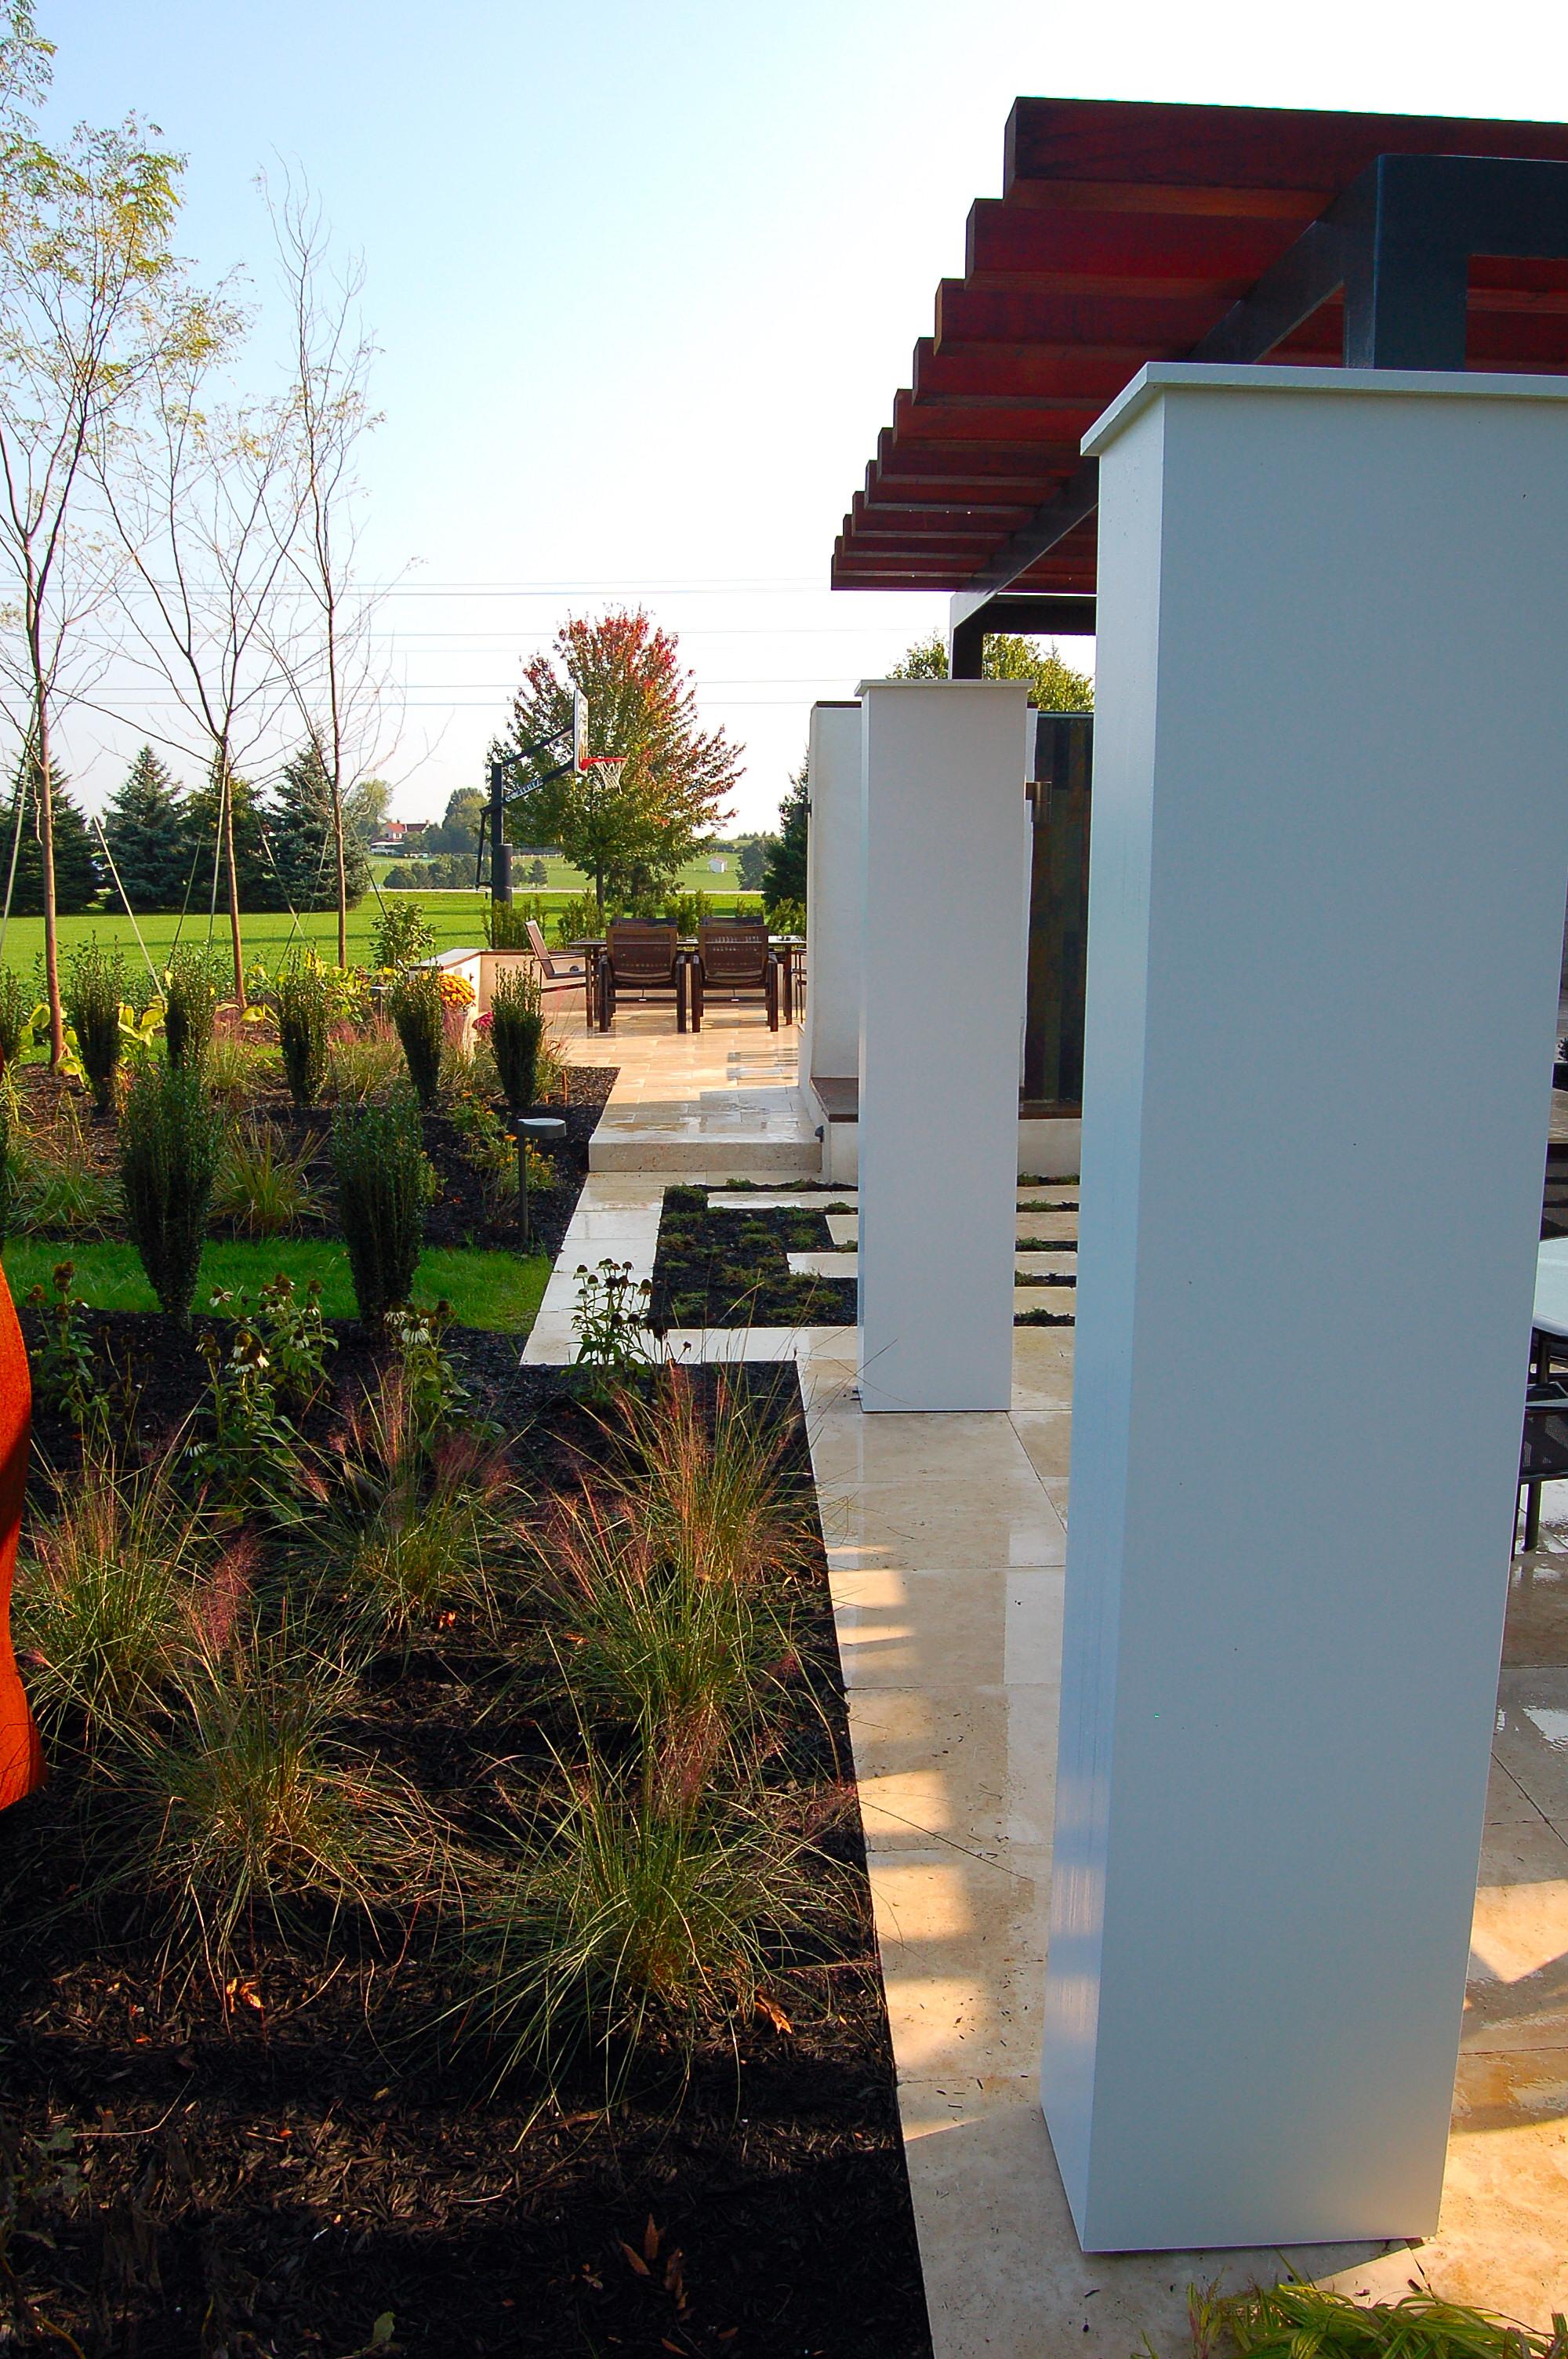 Garden design and pergola in York, PA